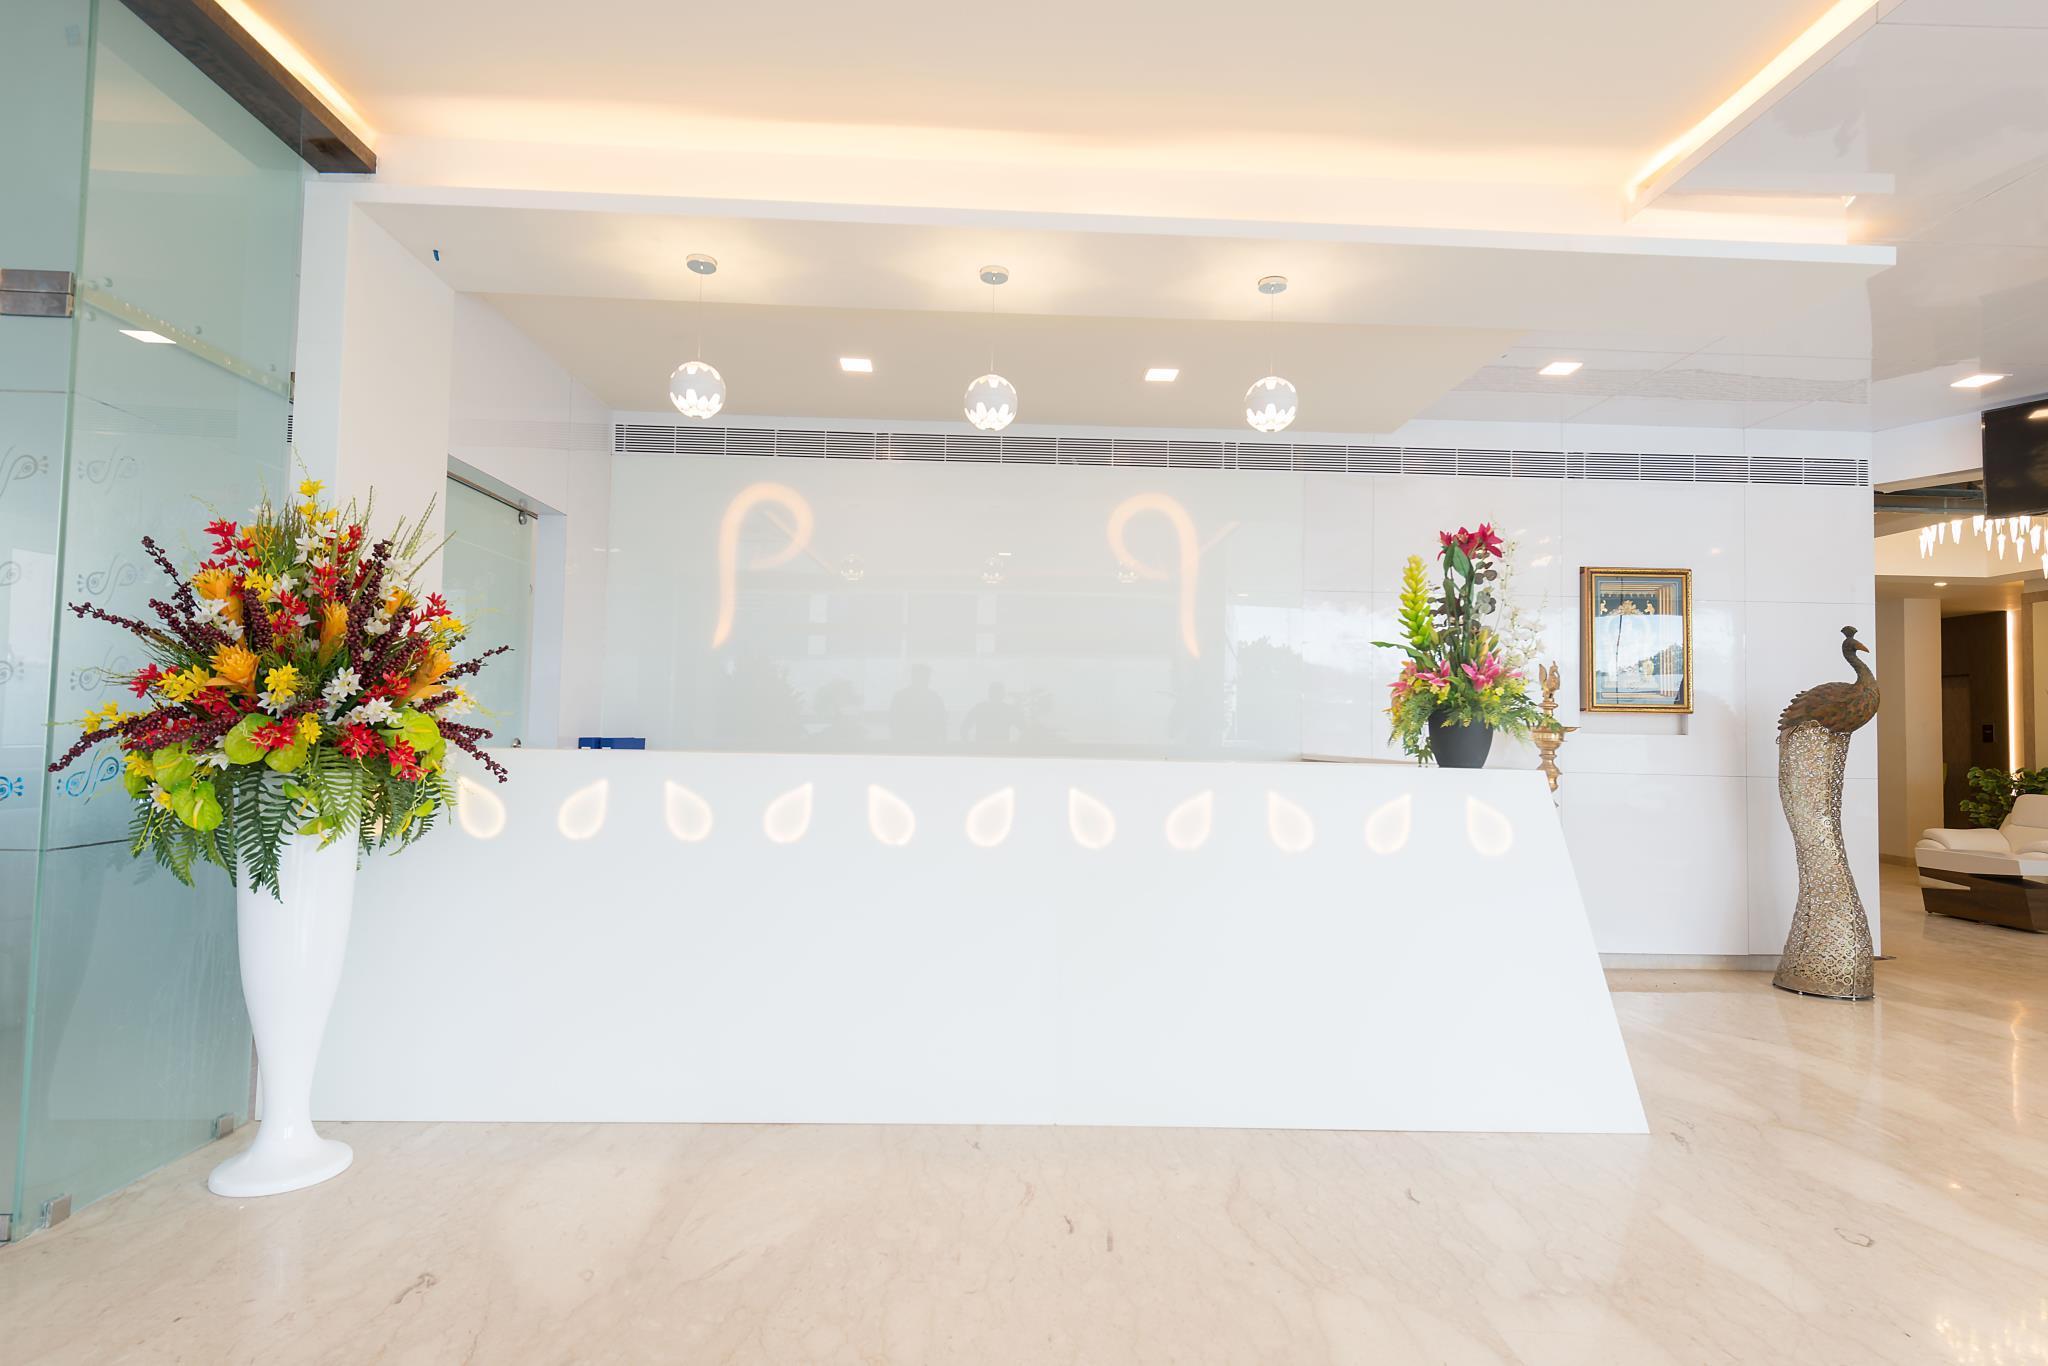 Book Hotel Chenthur Park Peelamedu Coimbatore 2019 Promos